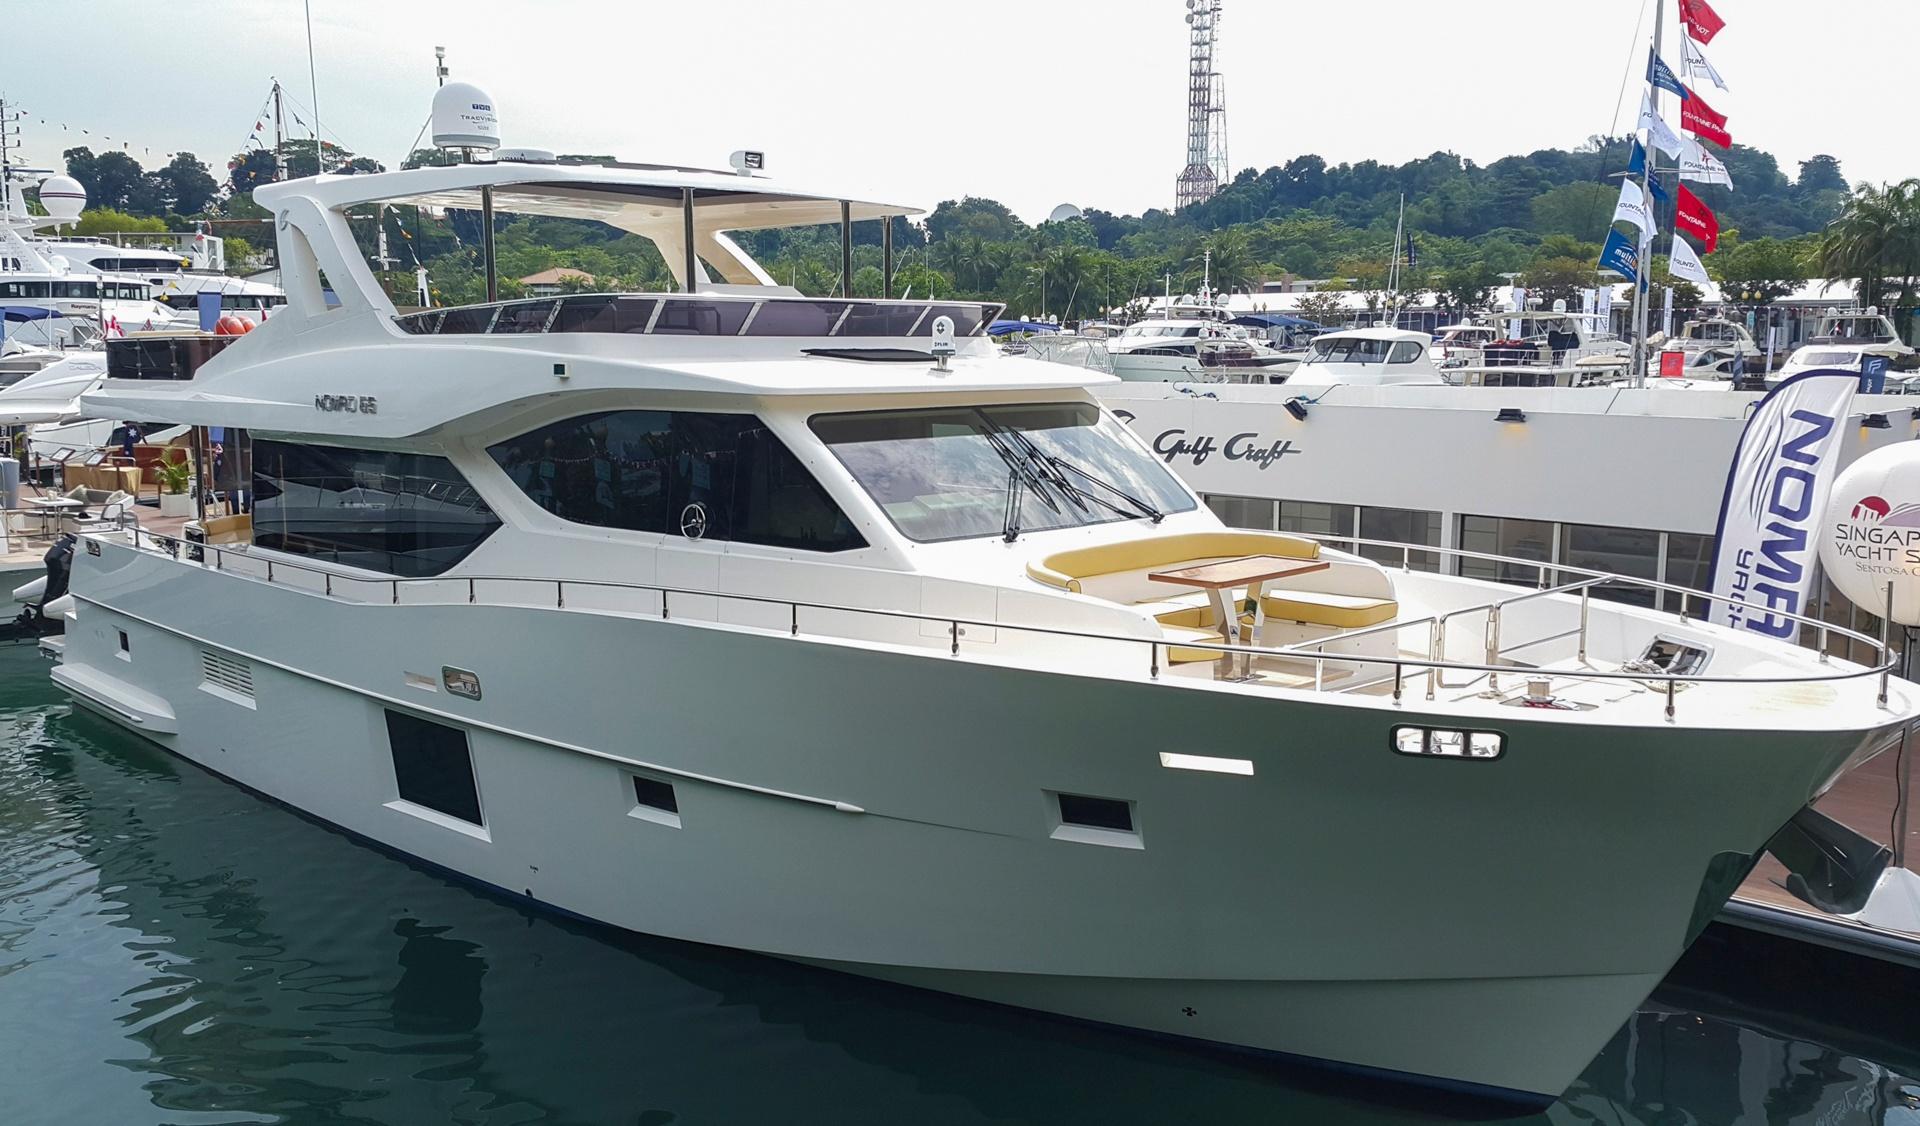 Gulf Craft at Singapore Yacht Show (2).jpg